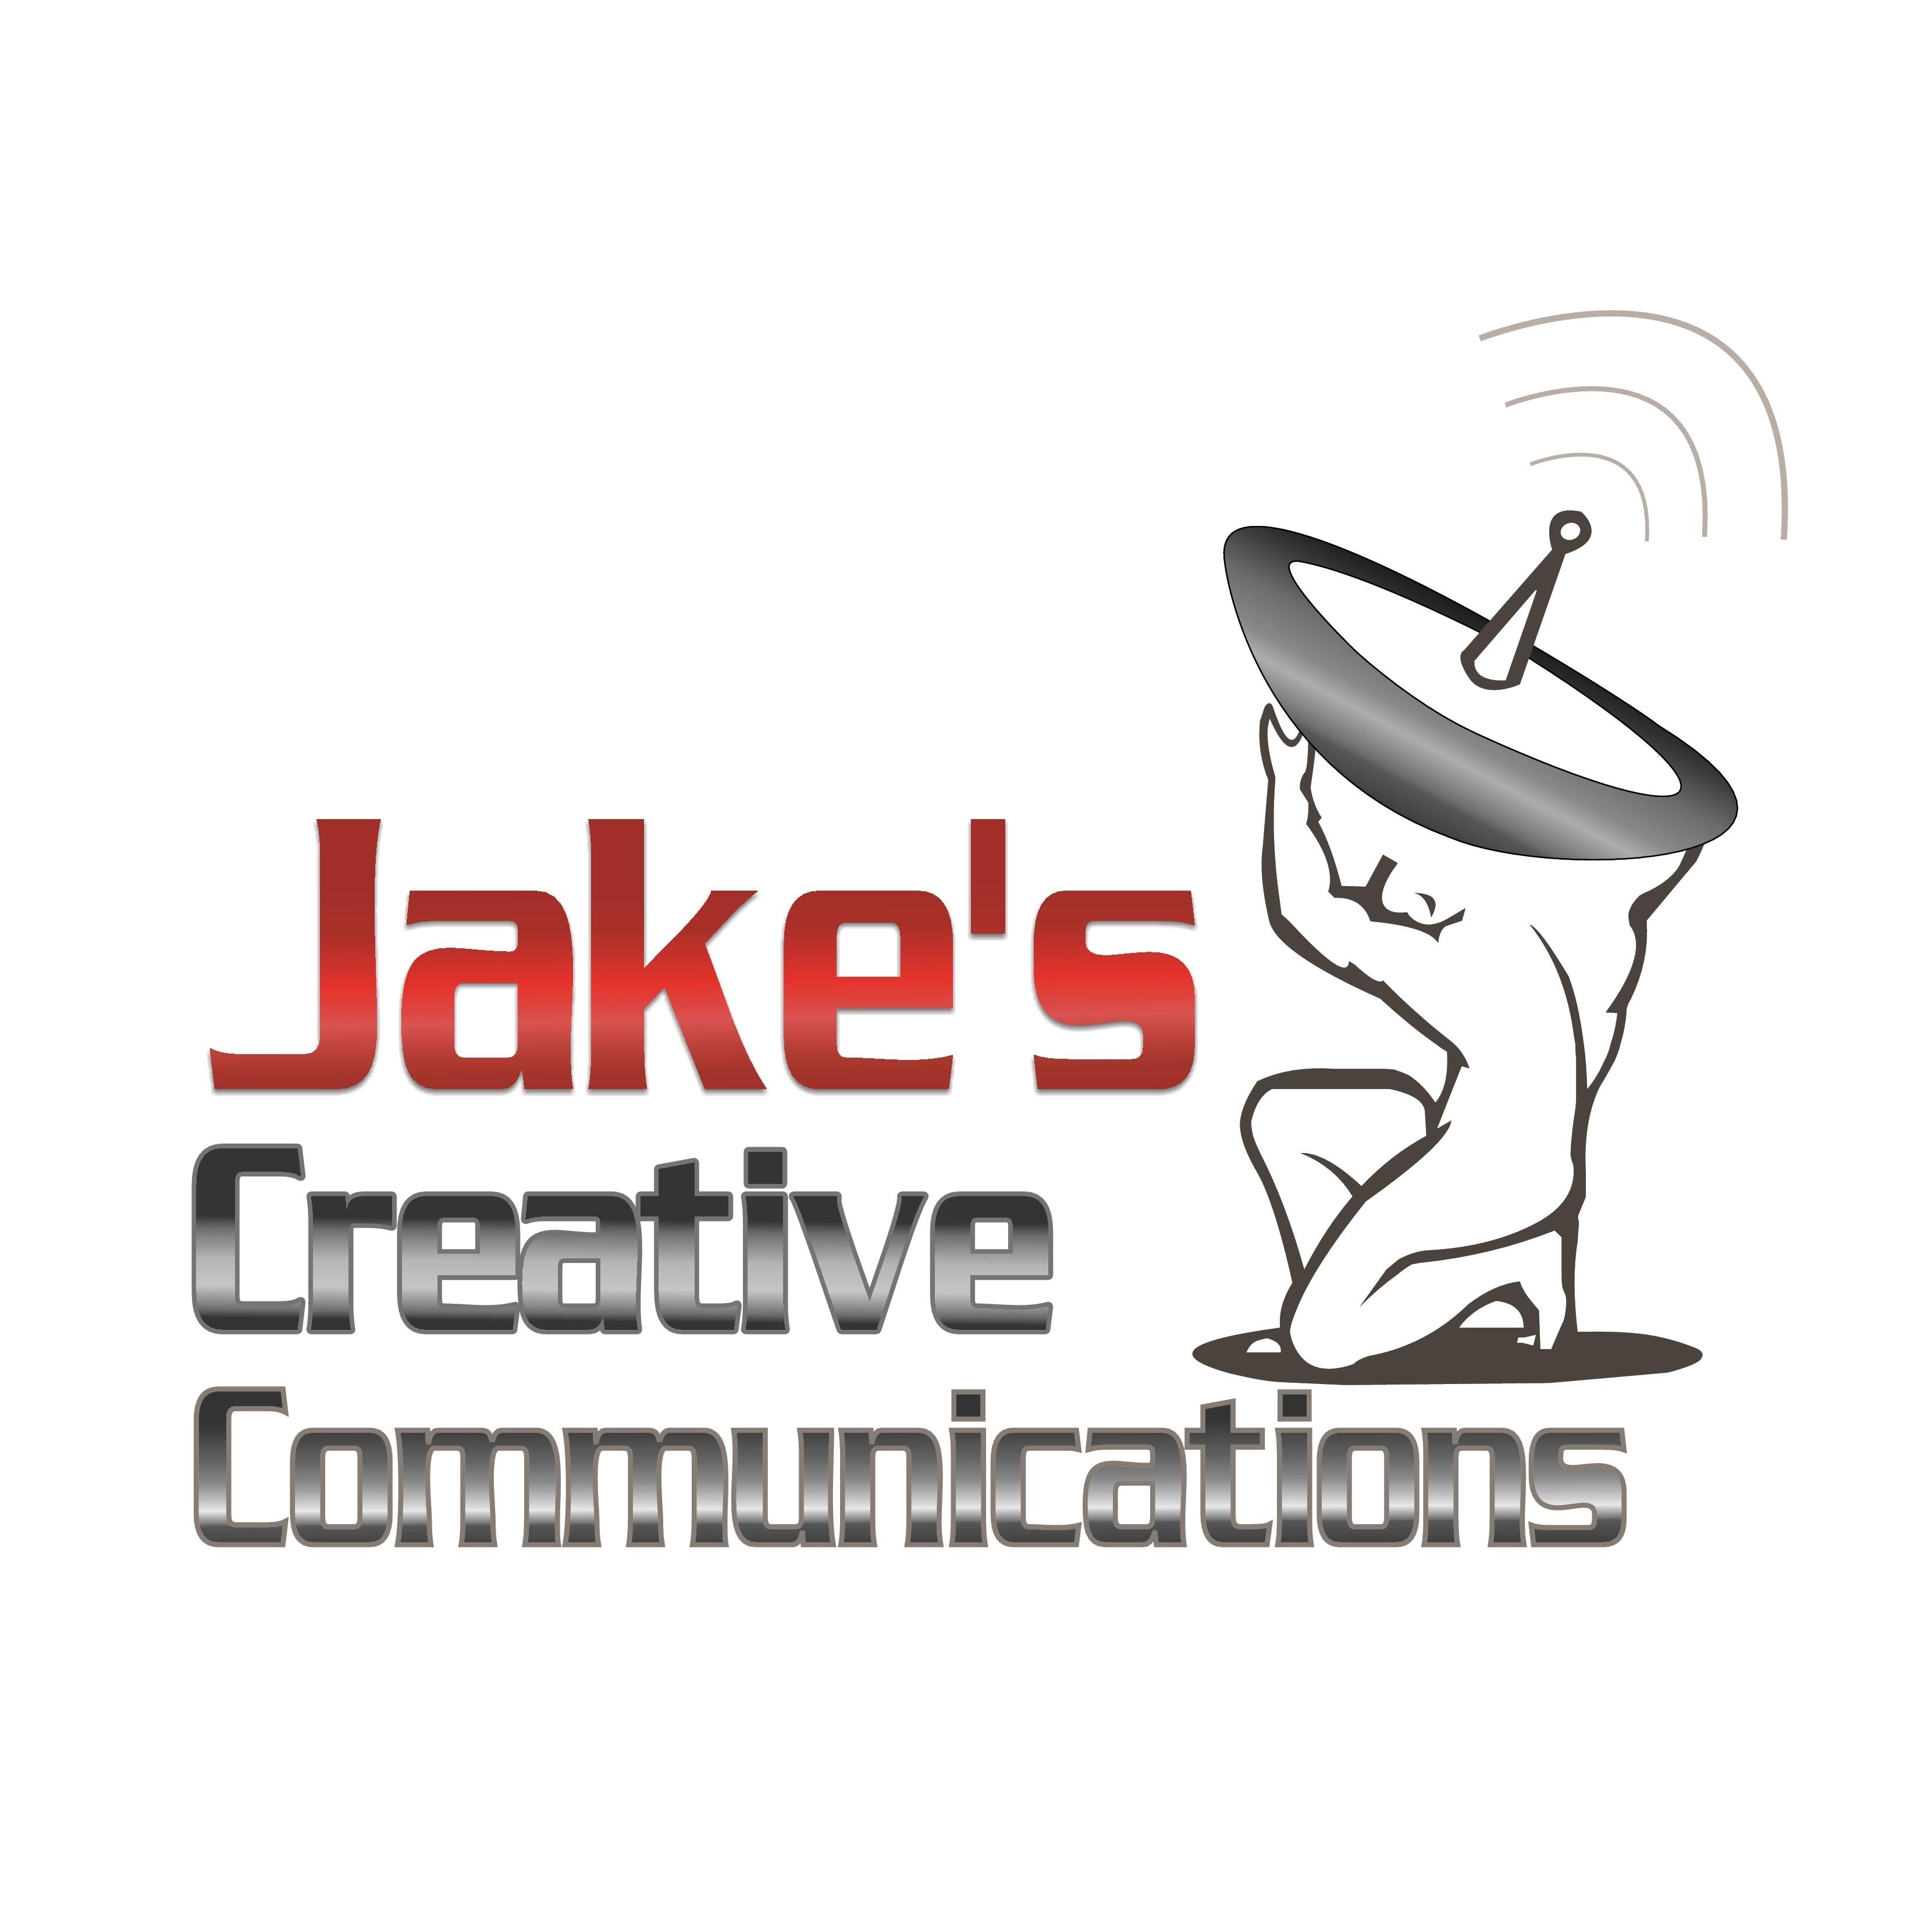 Jake's Creative Communications